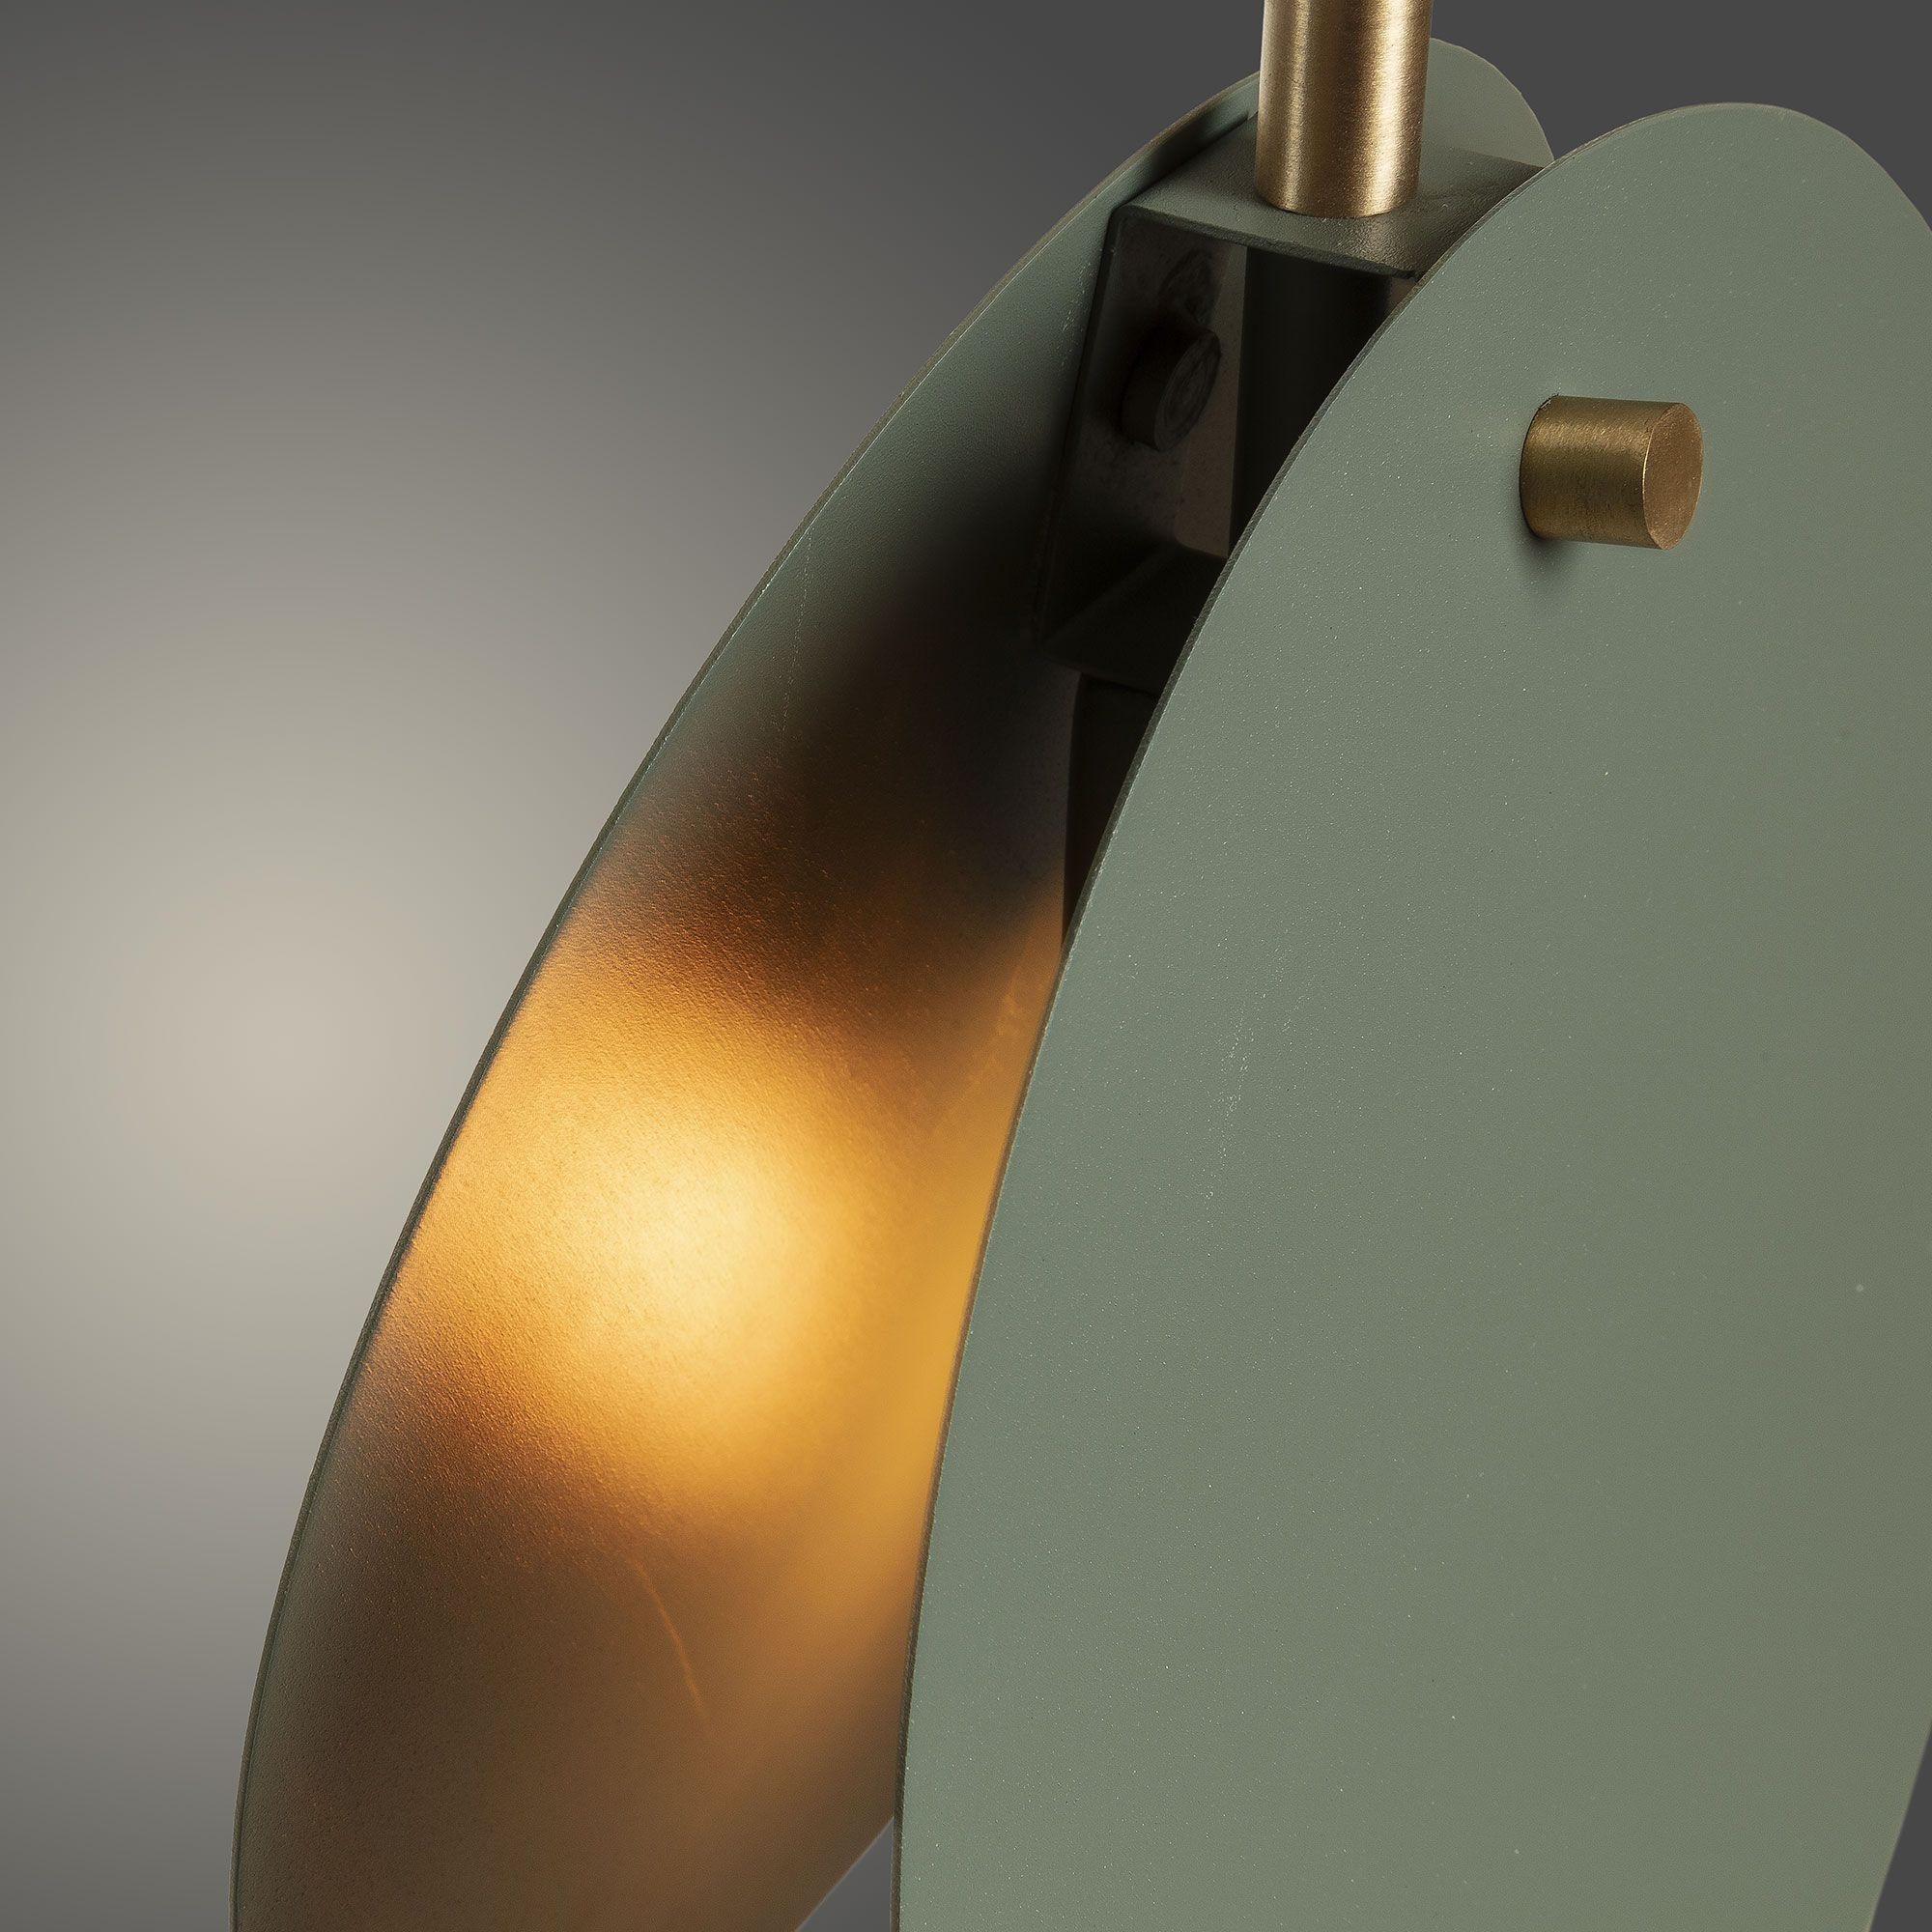 Kave Home Lámpara de techo..., en Metal - Verde #gedecktertisch